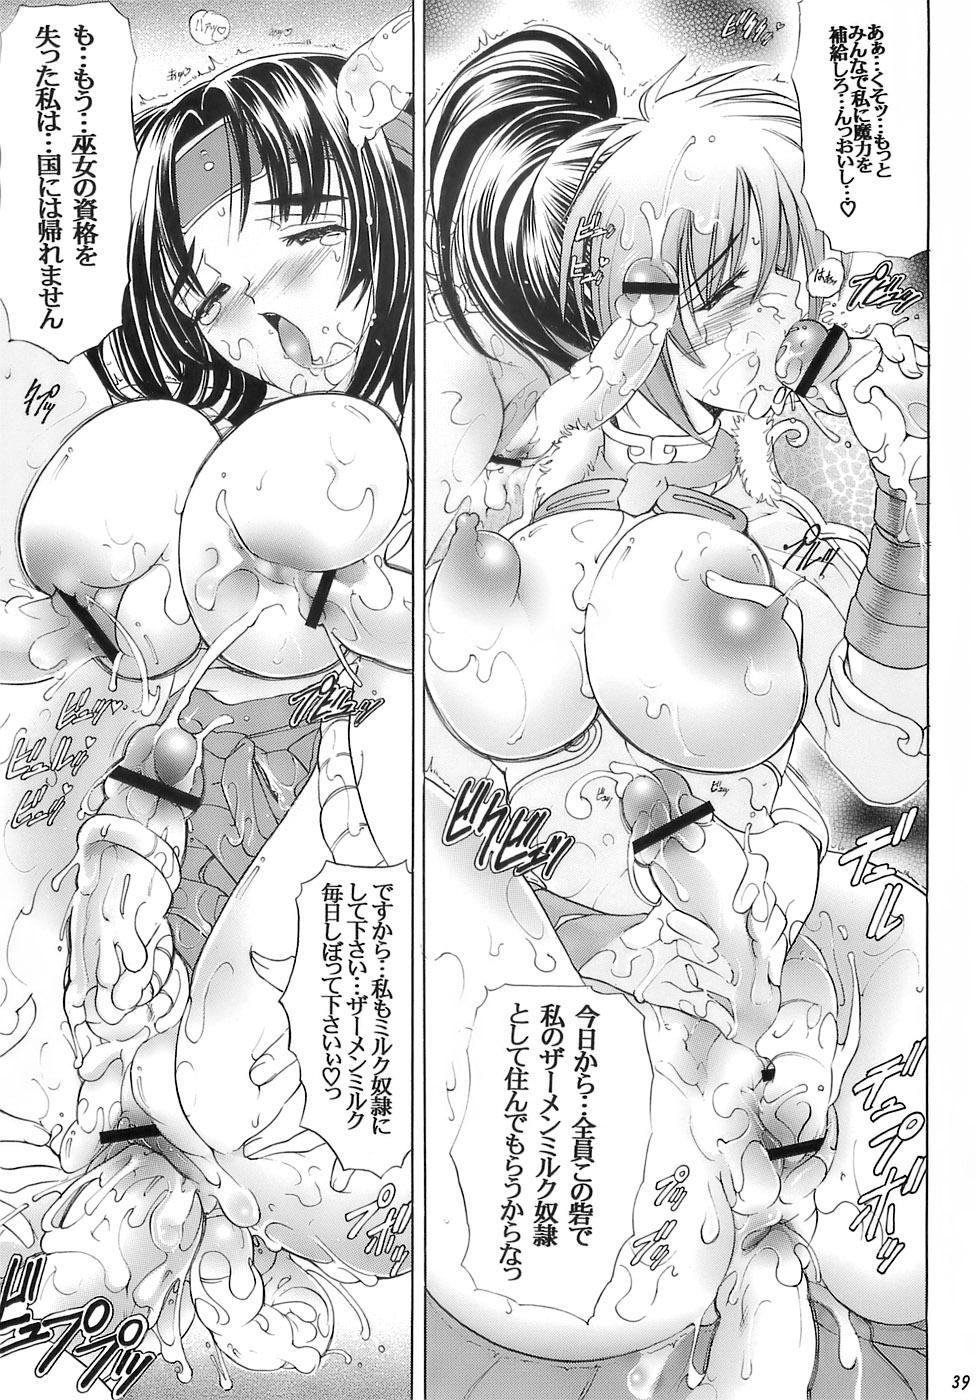 (C71) [Kawaraya Honpo (Kawaraya A-ta)] Hana - Maki no Juusan - Hana no Sumeragi (Queen's Blade) 38